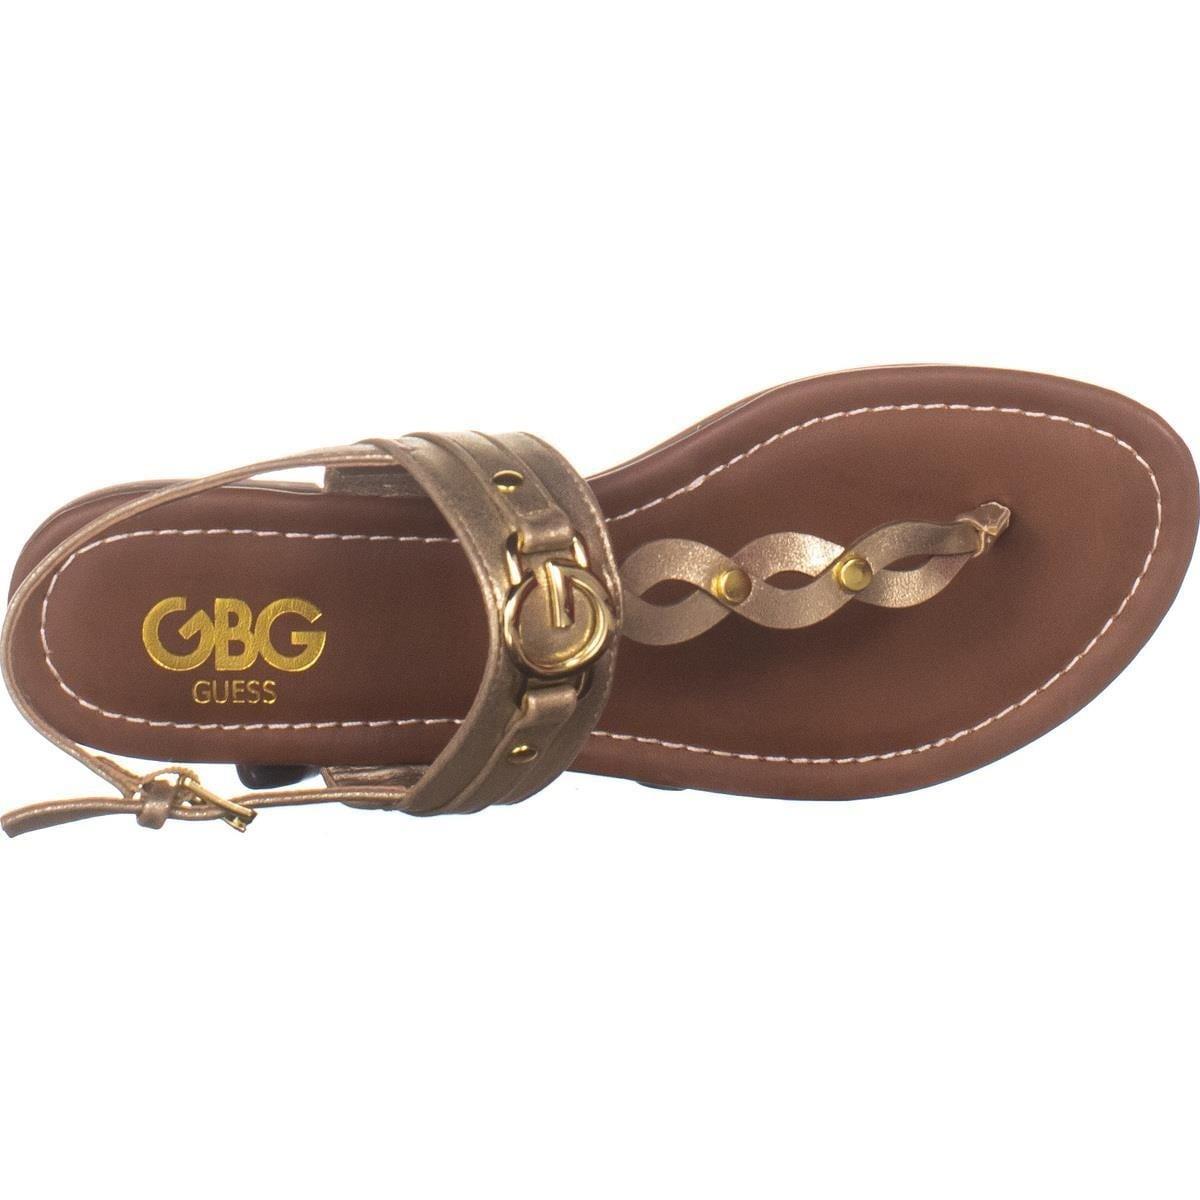 GBG Guess Links Flat Thong Sandals